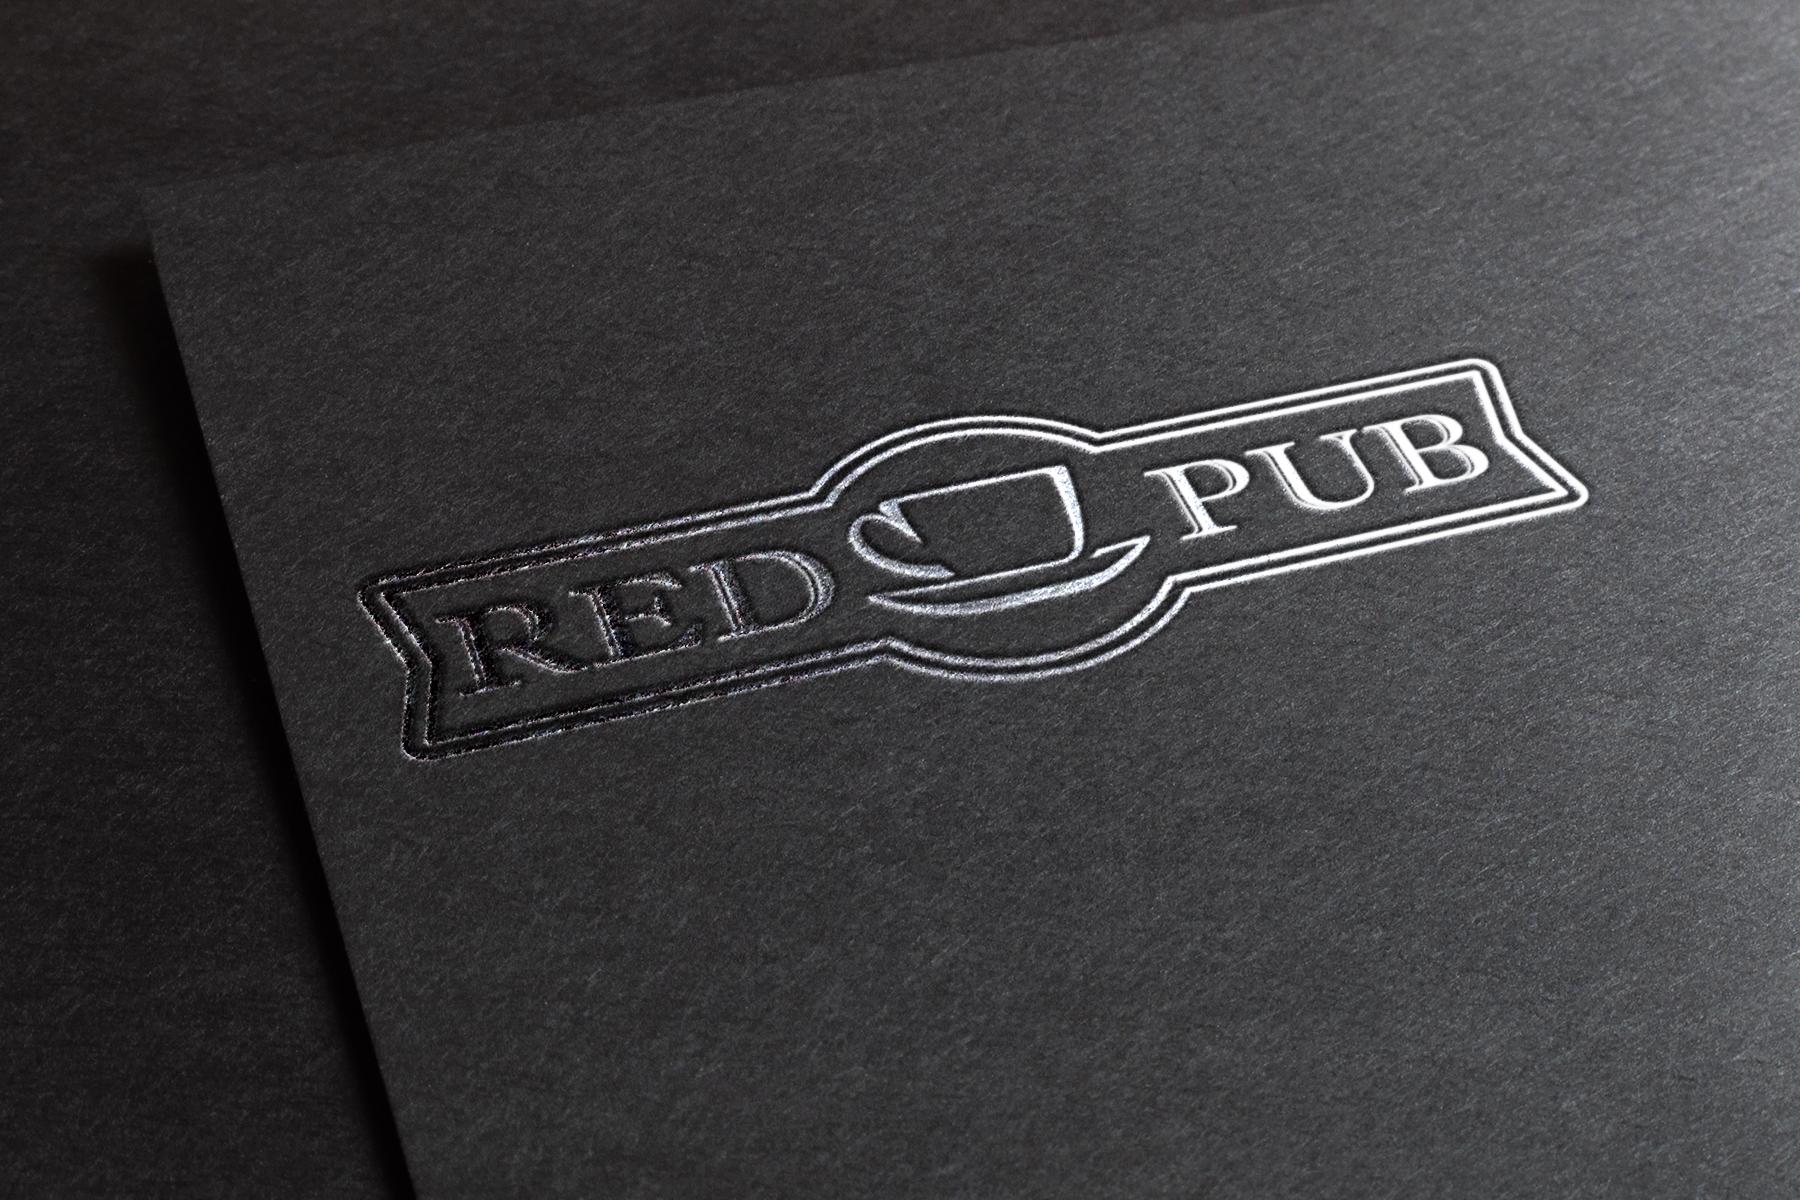 Red Cup Pub - серебряное тиснение